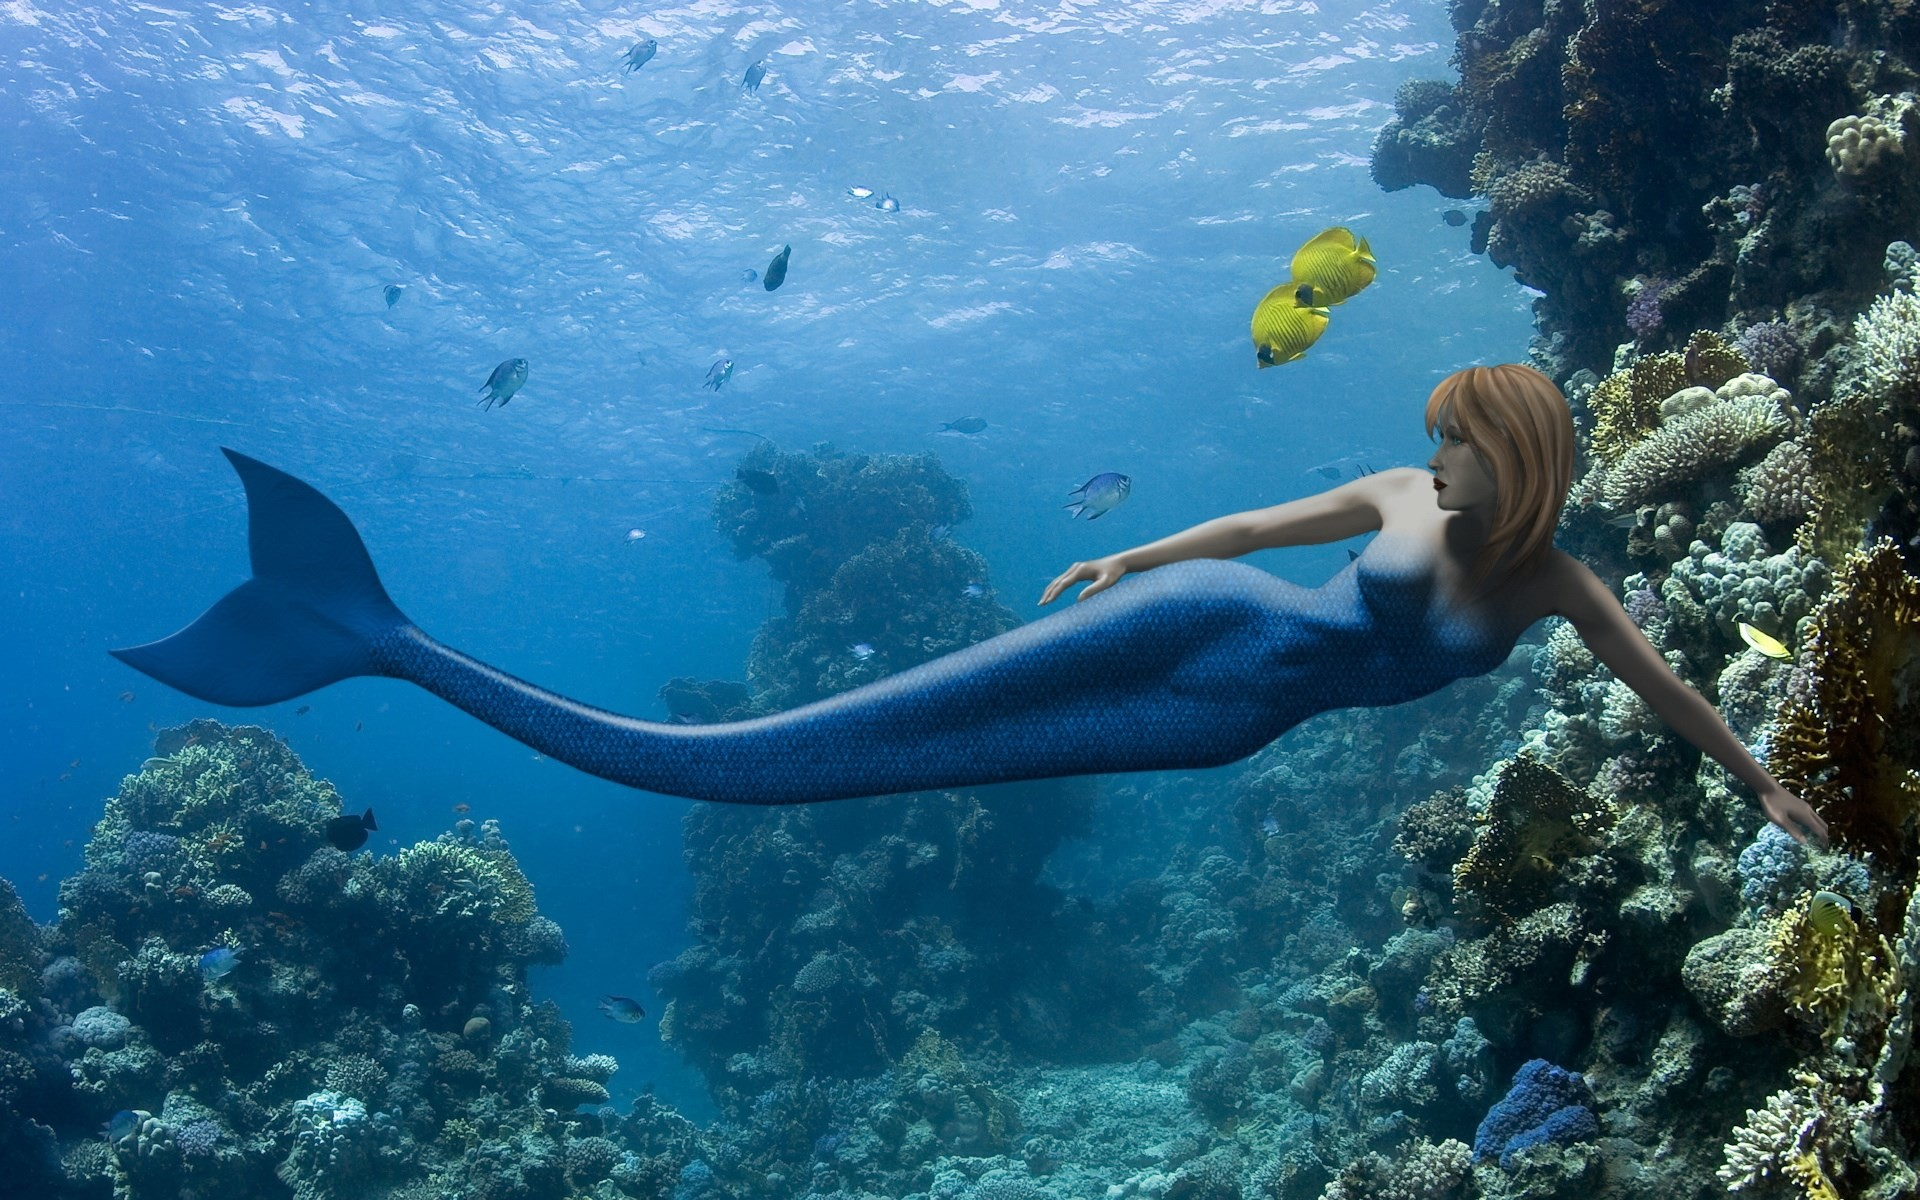 mermaid picture for desktop hd, 1920 x 1200 (1839 kB)